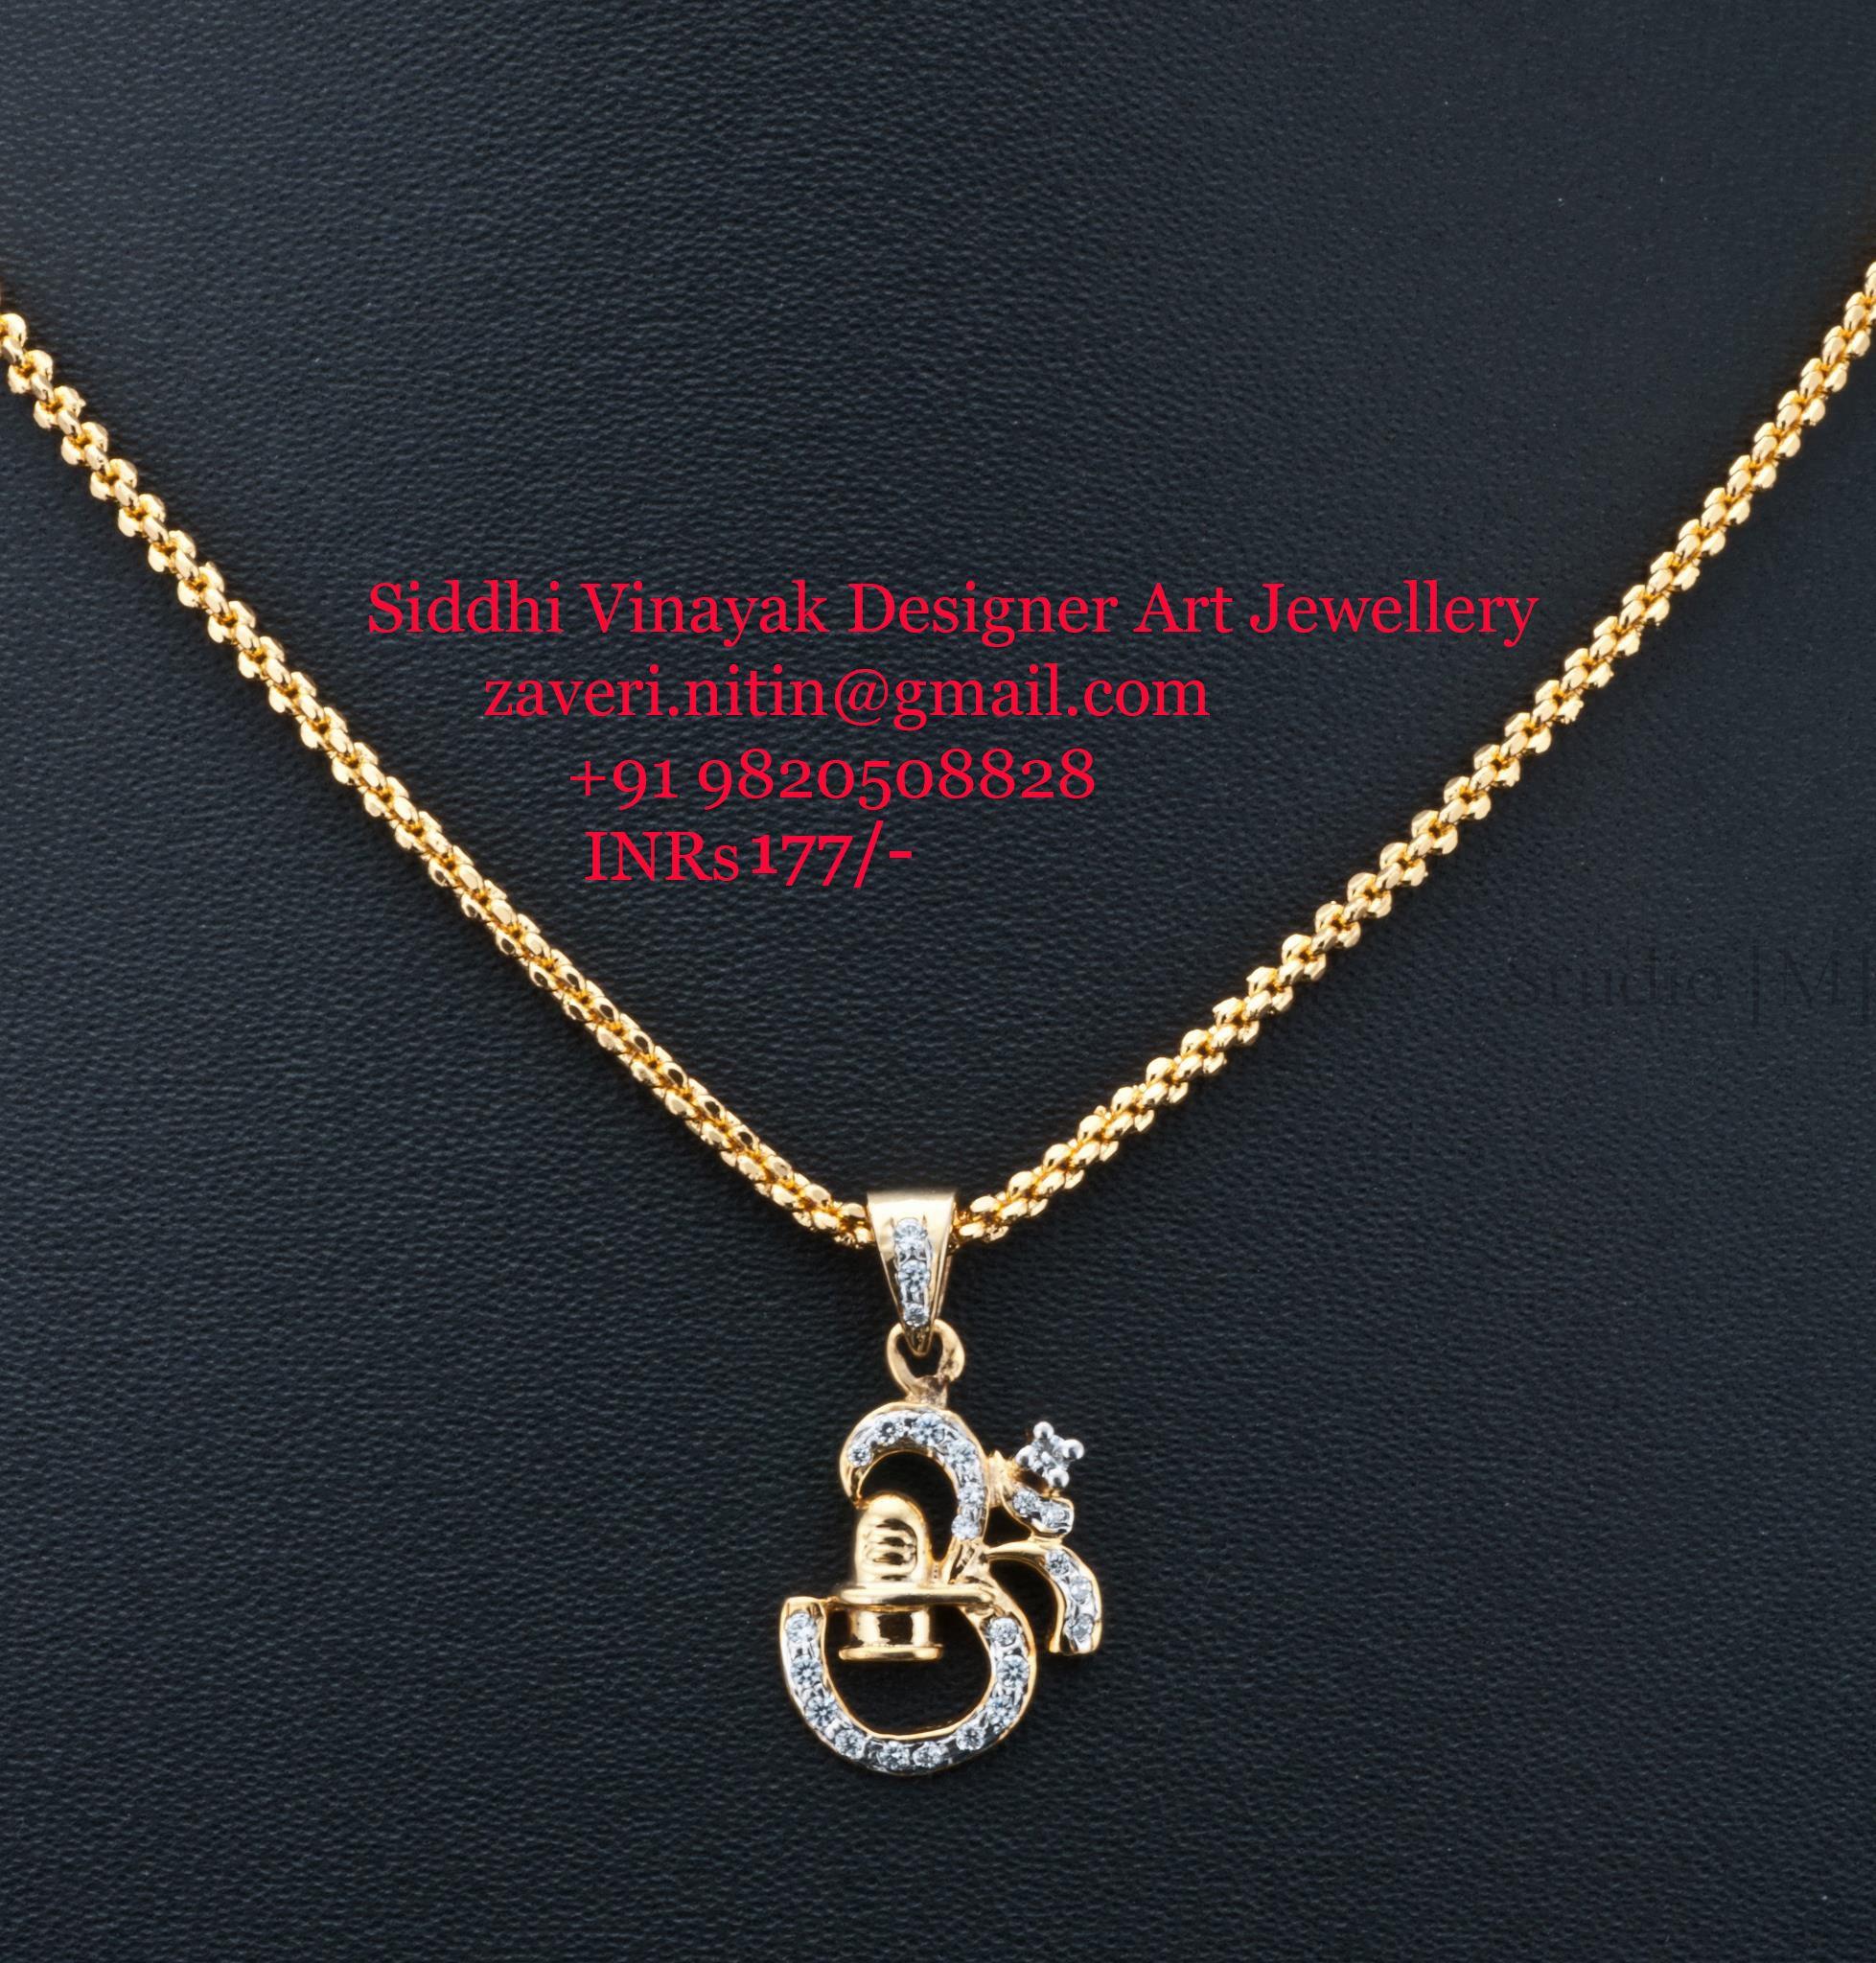 Exclusive goldplated pendant with american diamondscz divine